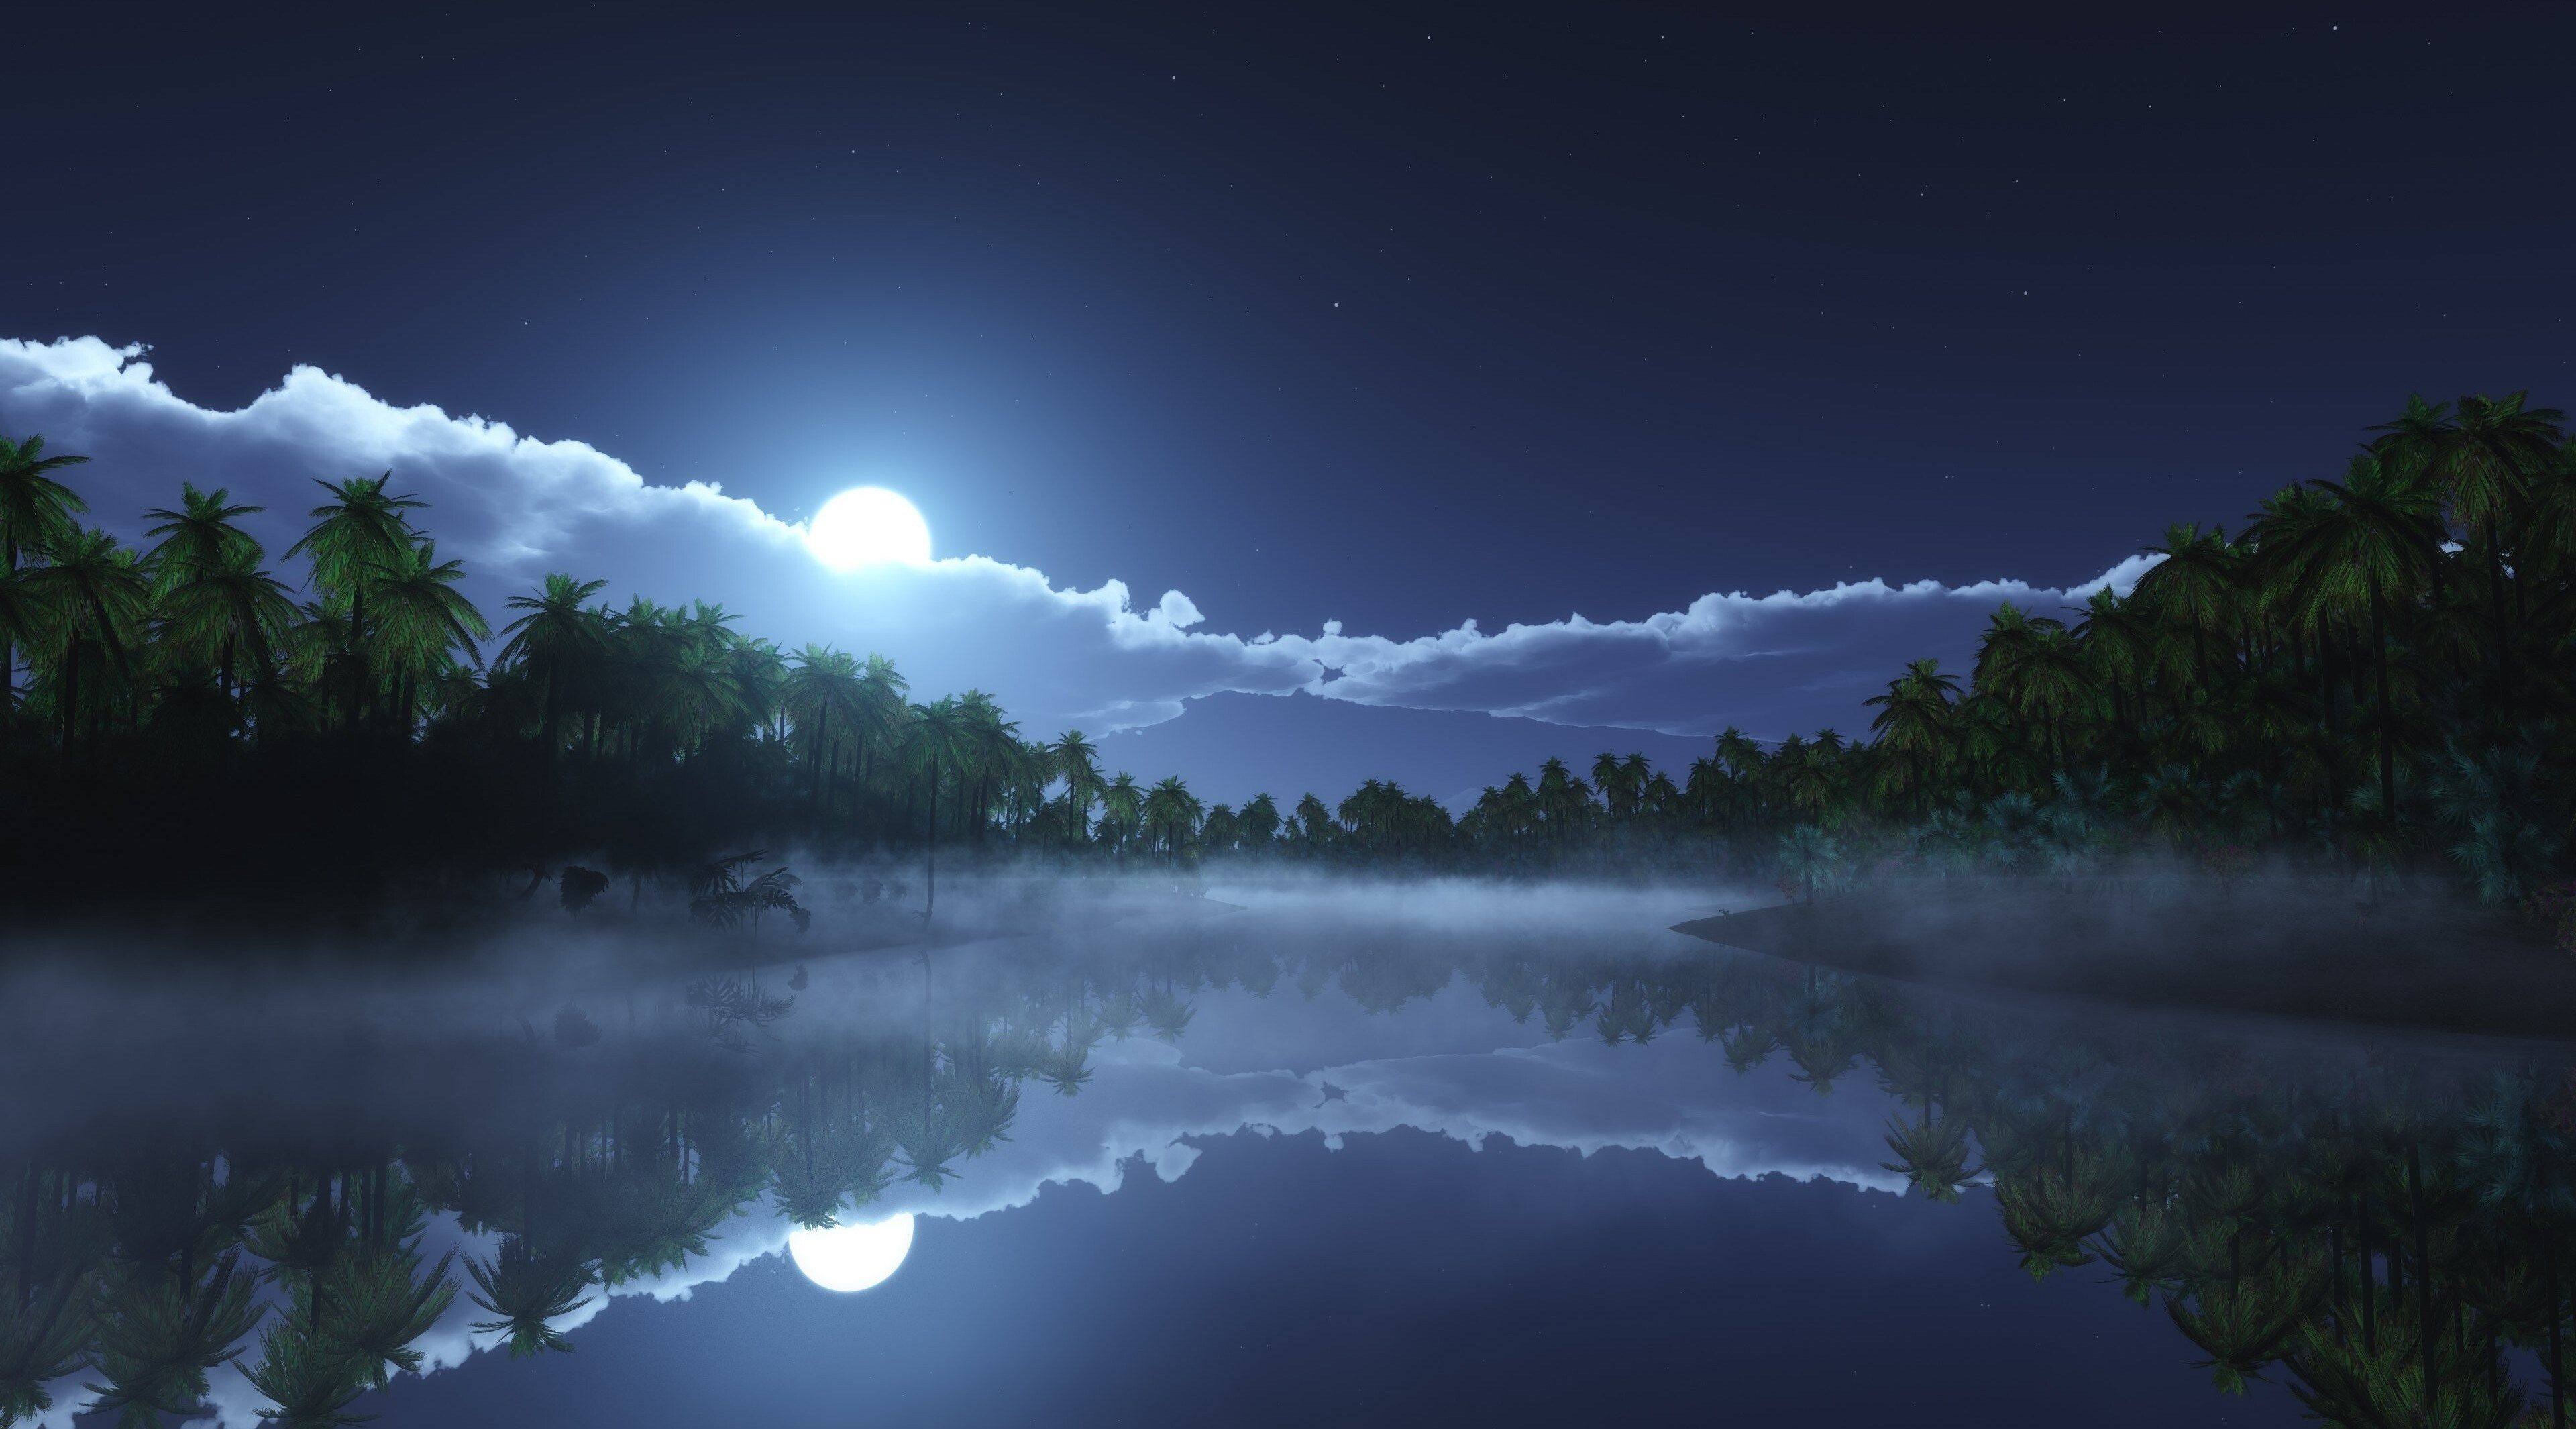 3840x2130 River 4k Pics Free Download Beautiful Night Sky Night Sky Wallpaper Nature Water